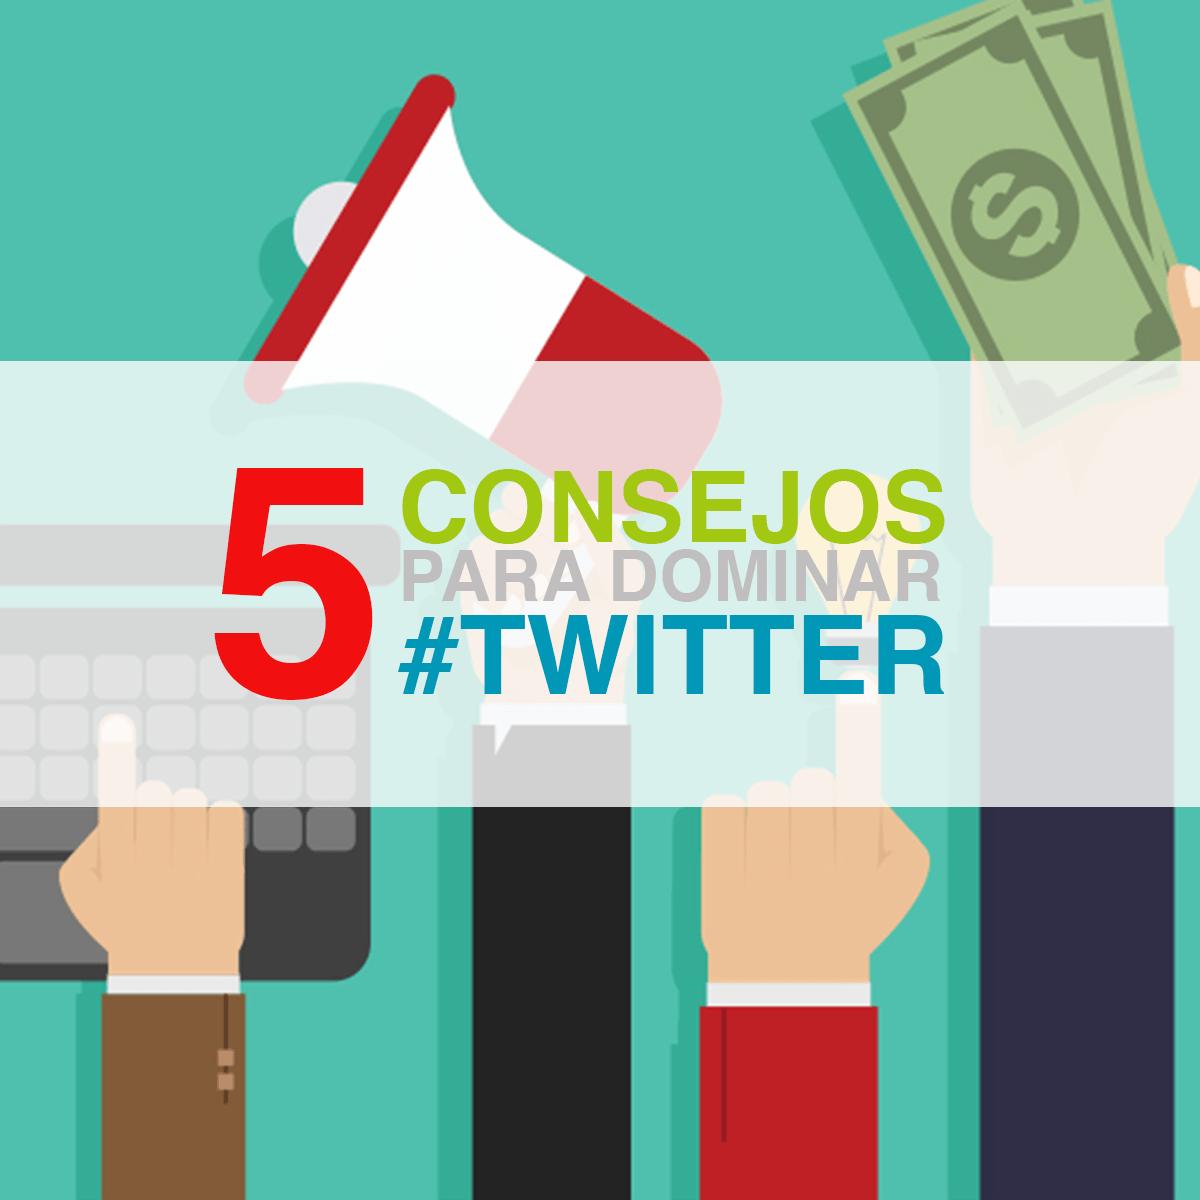 5 consejos para dominar Twitter